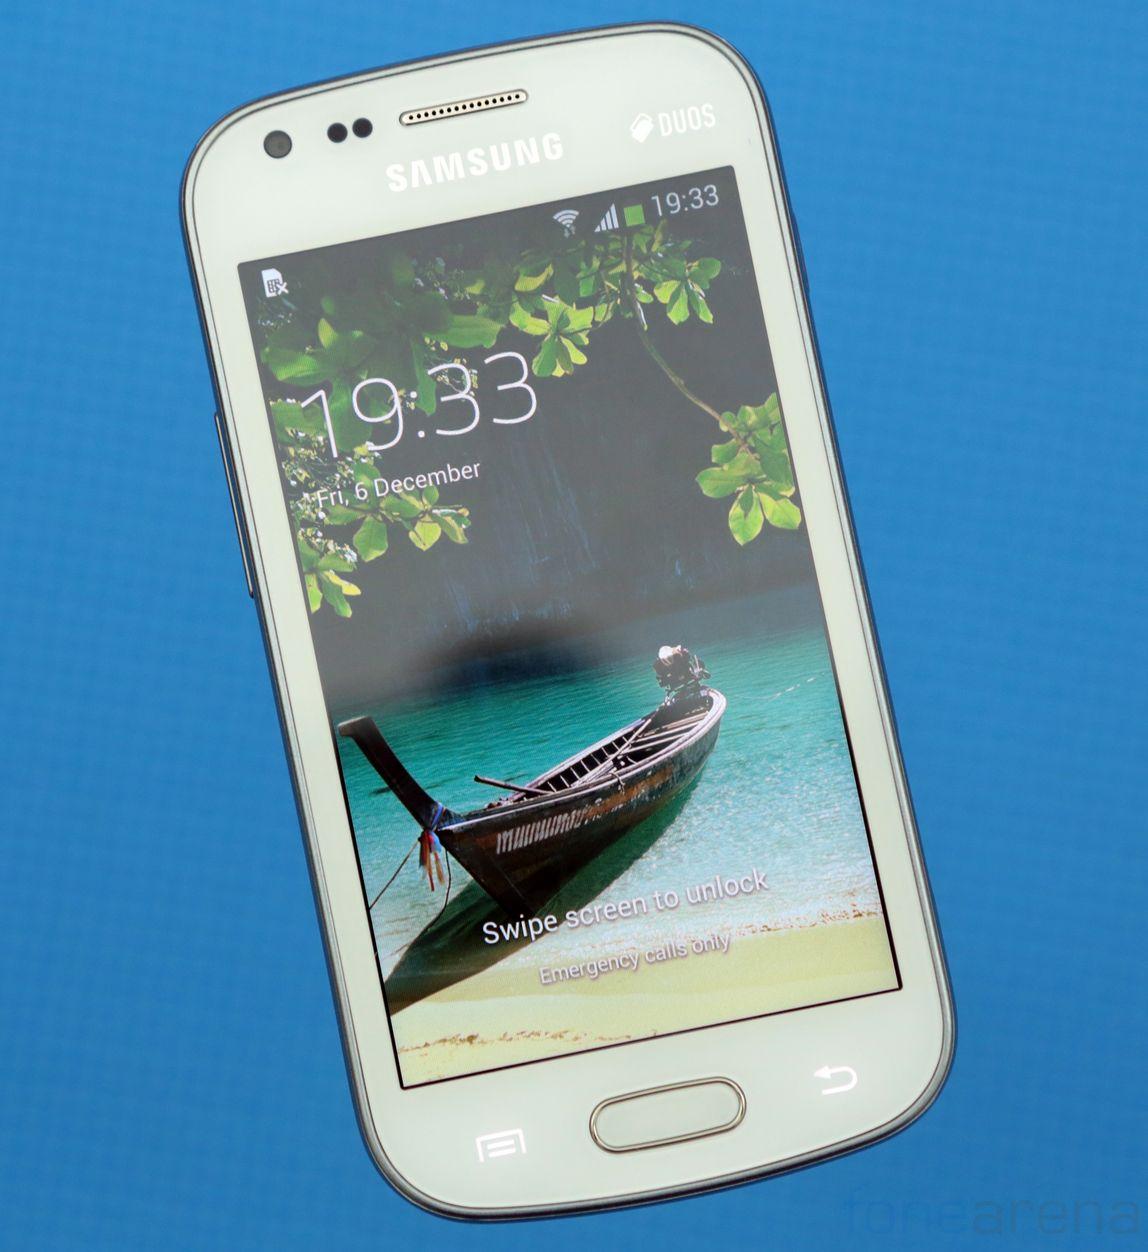 Samsung Galaxy S Duos 2 Photo Gallery